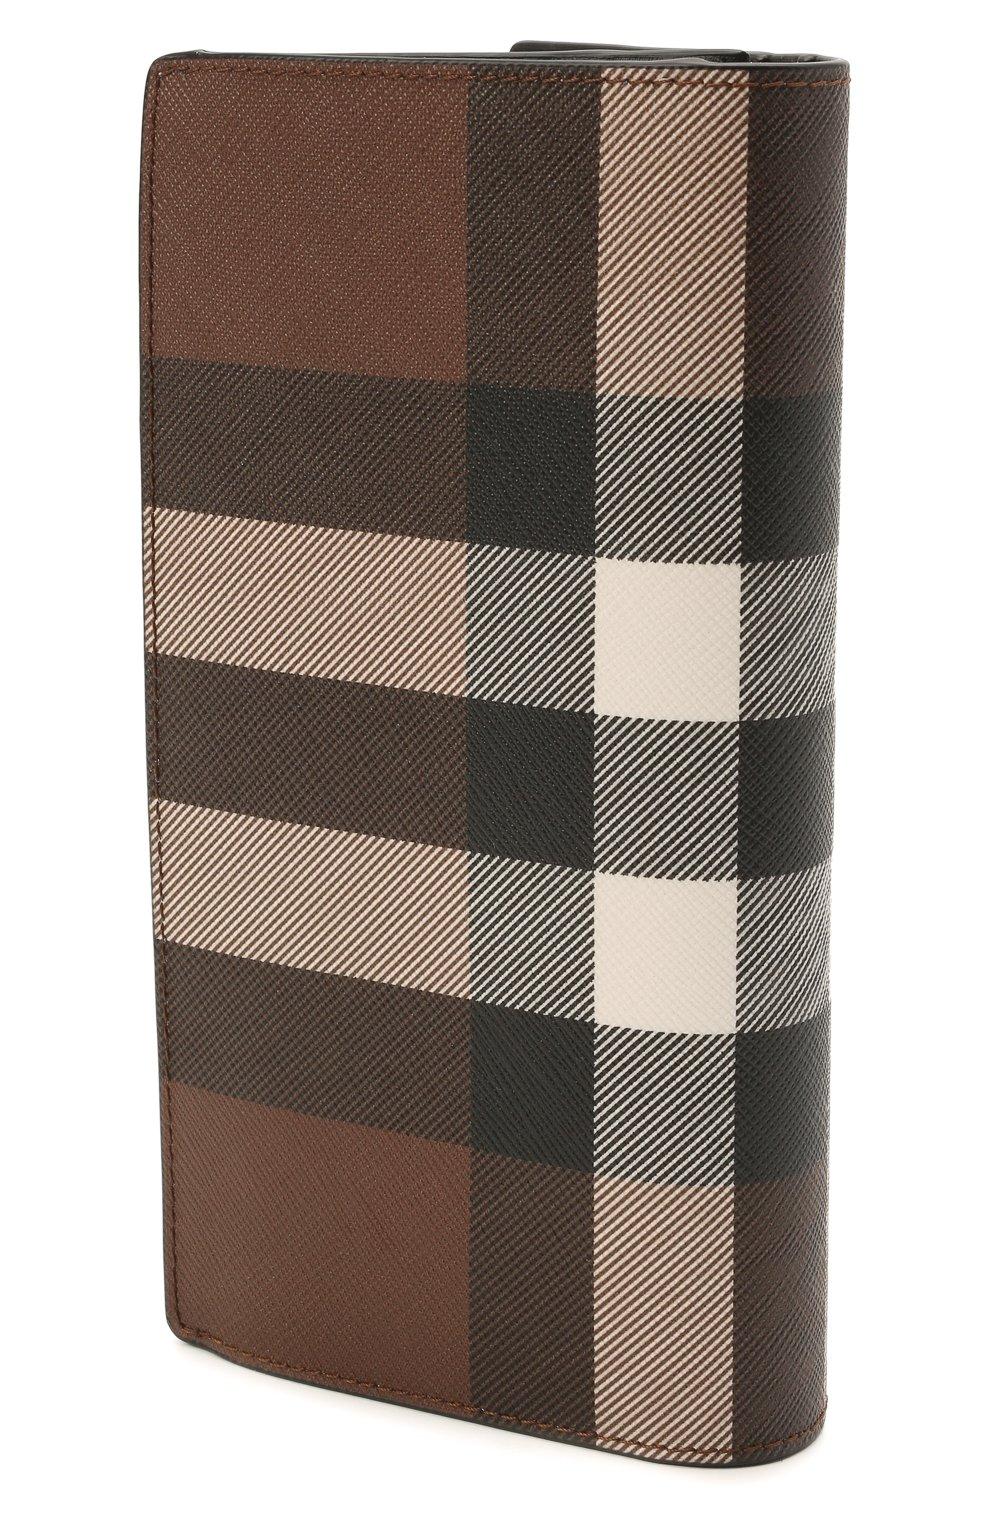 Мужской портмоне BURBERRY коричневого цвета, арт. 8036670 | Фото 2 (Материал: Экокожа)